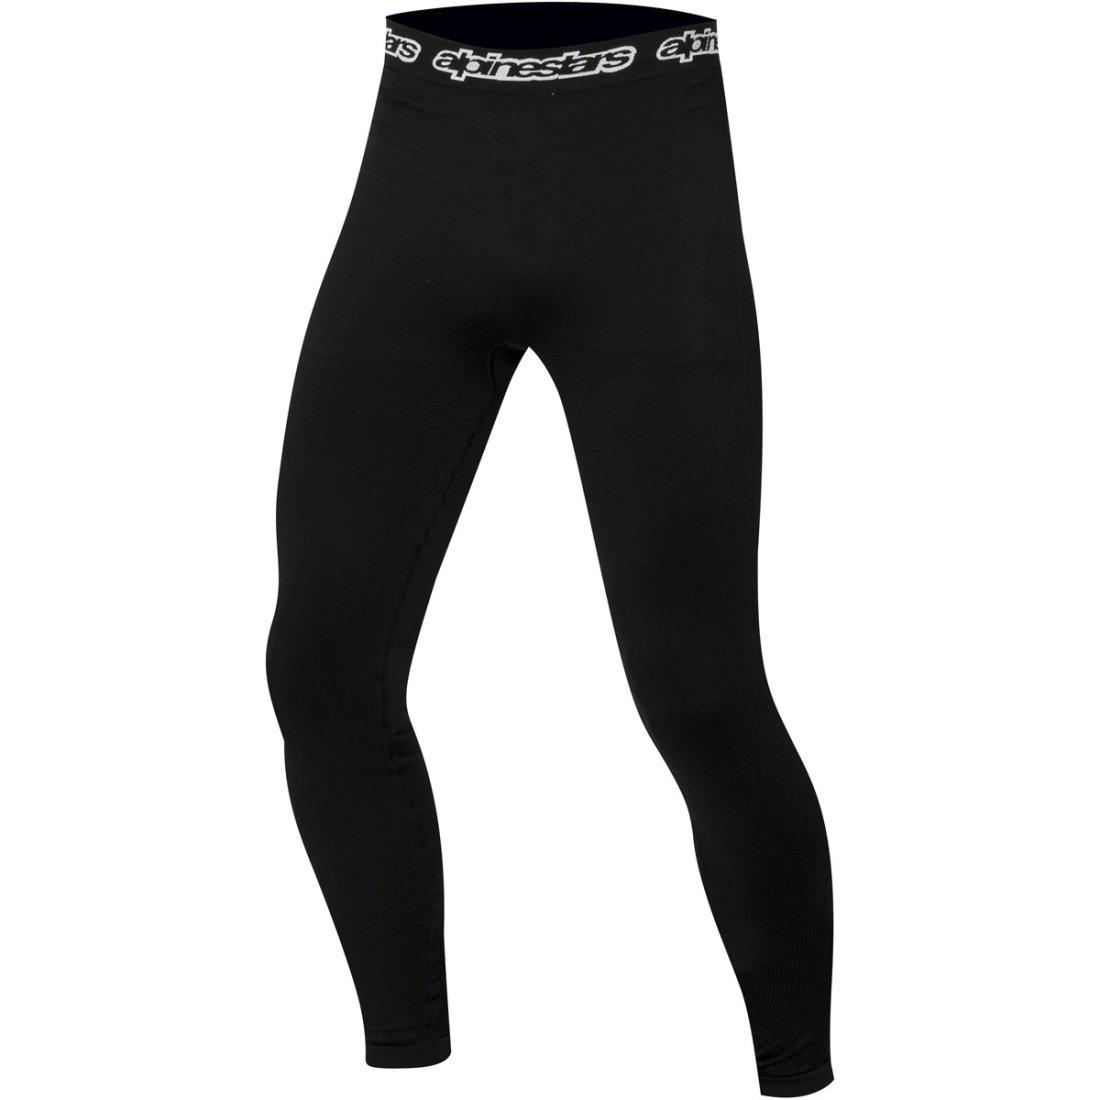 Alpinestars Kx Winter Black Complement Motocard Pants 10